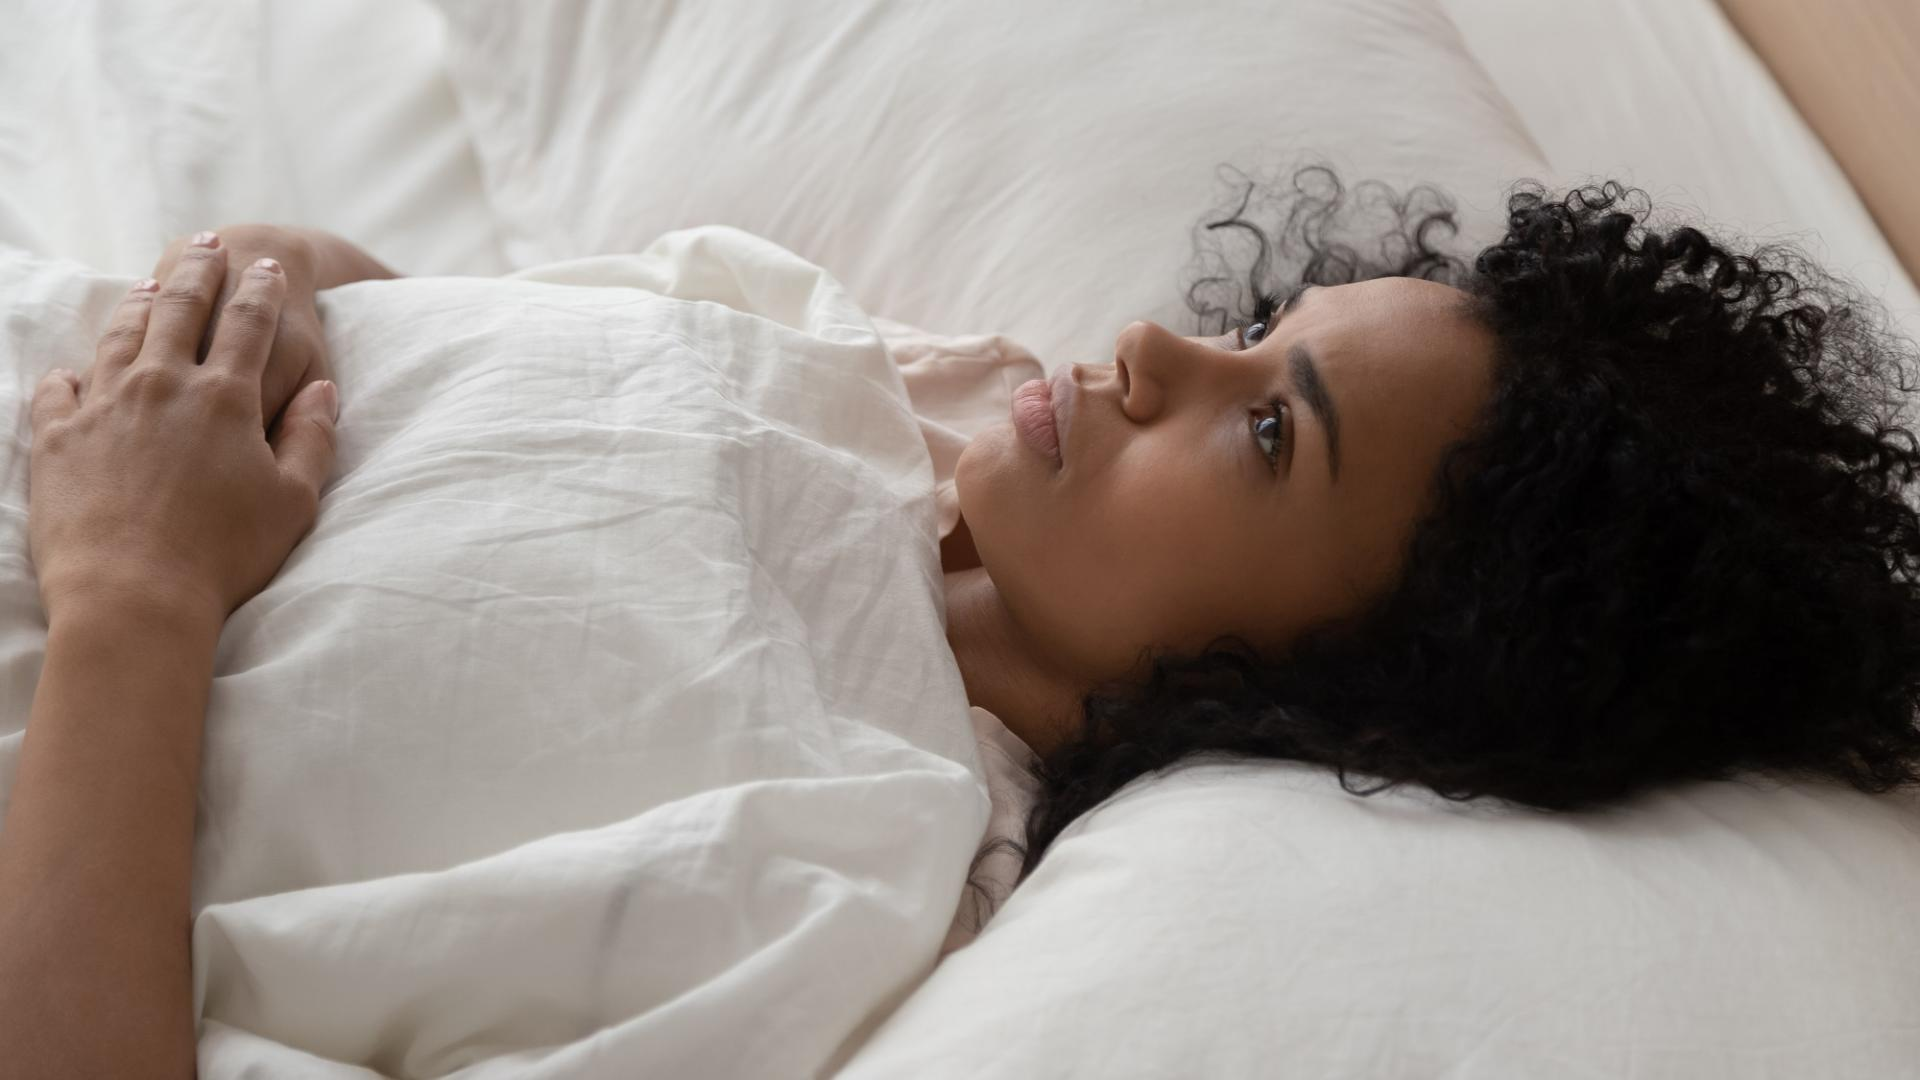 Frau, Periode, Bett